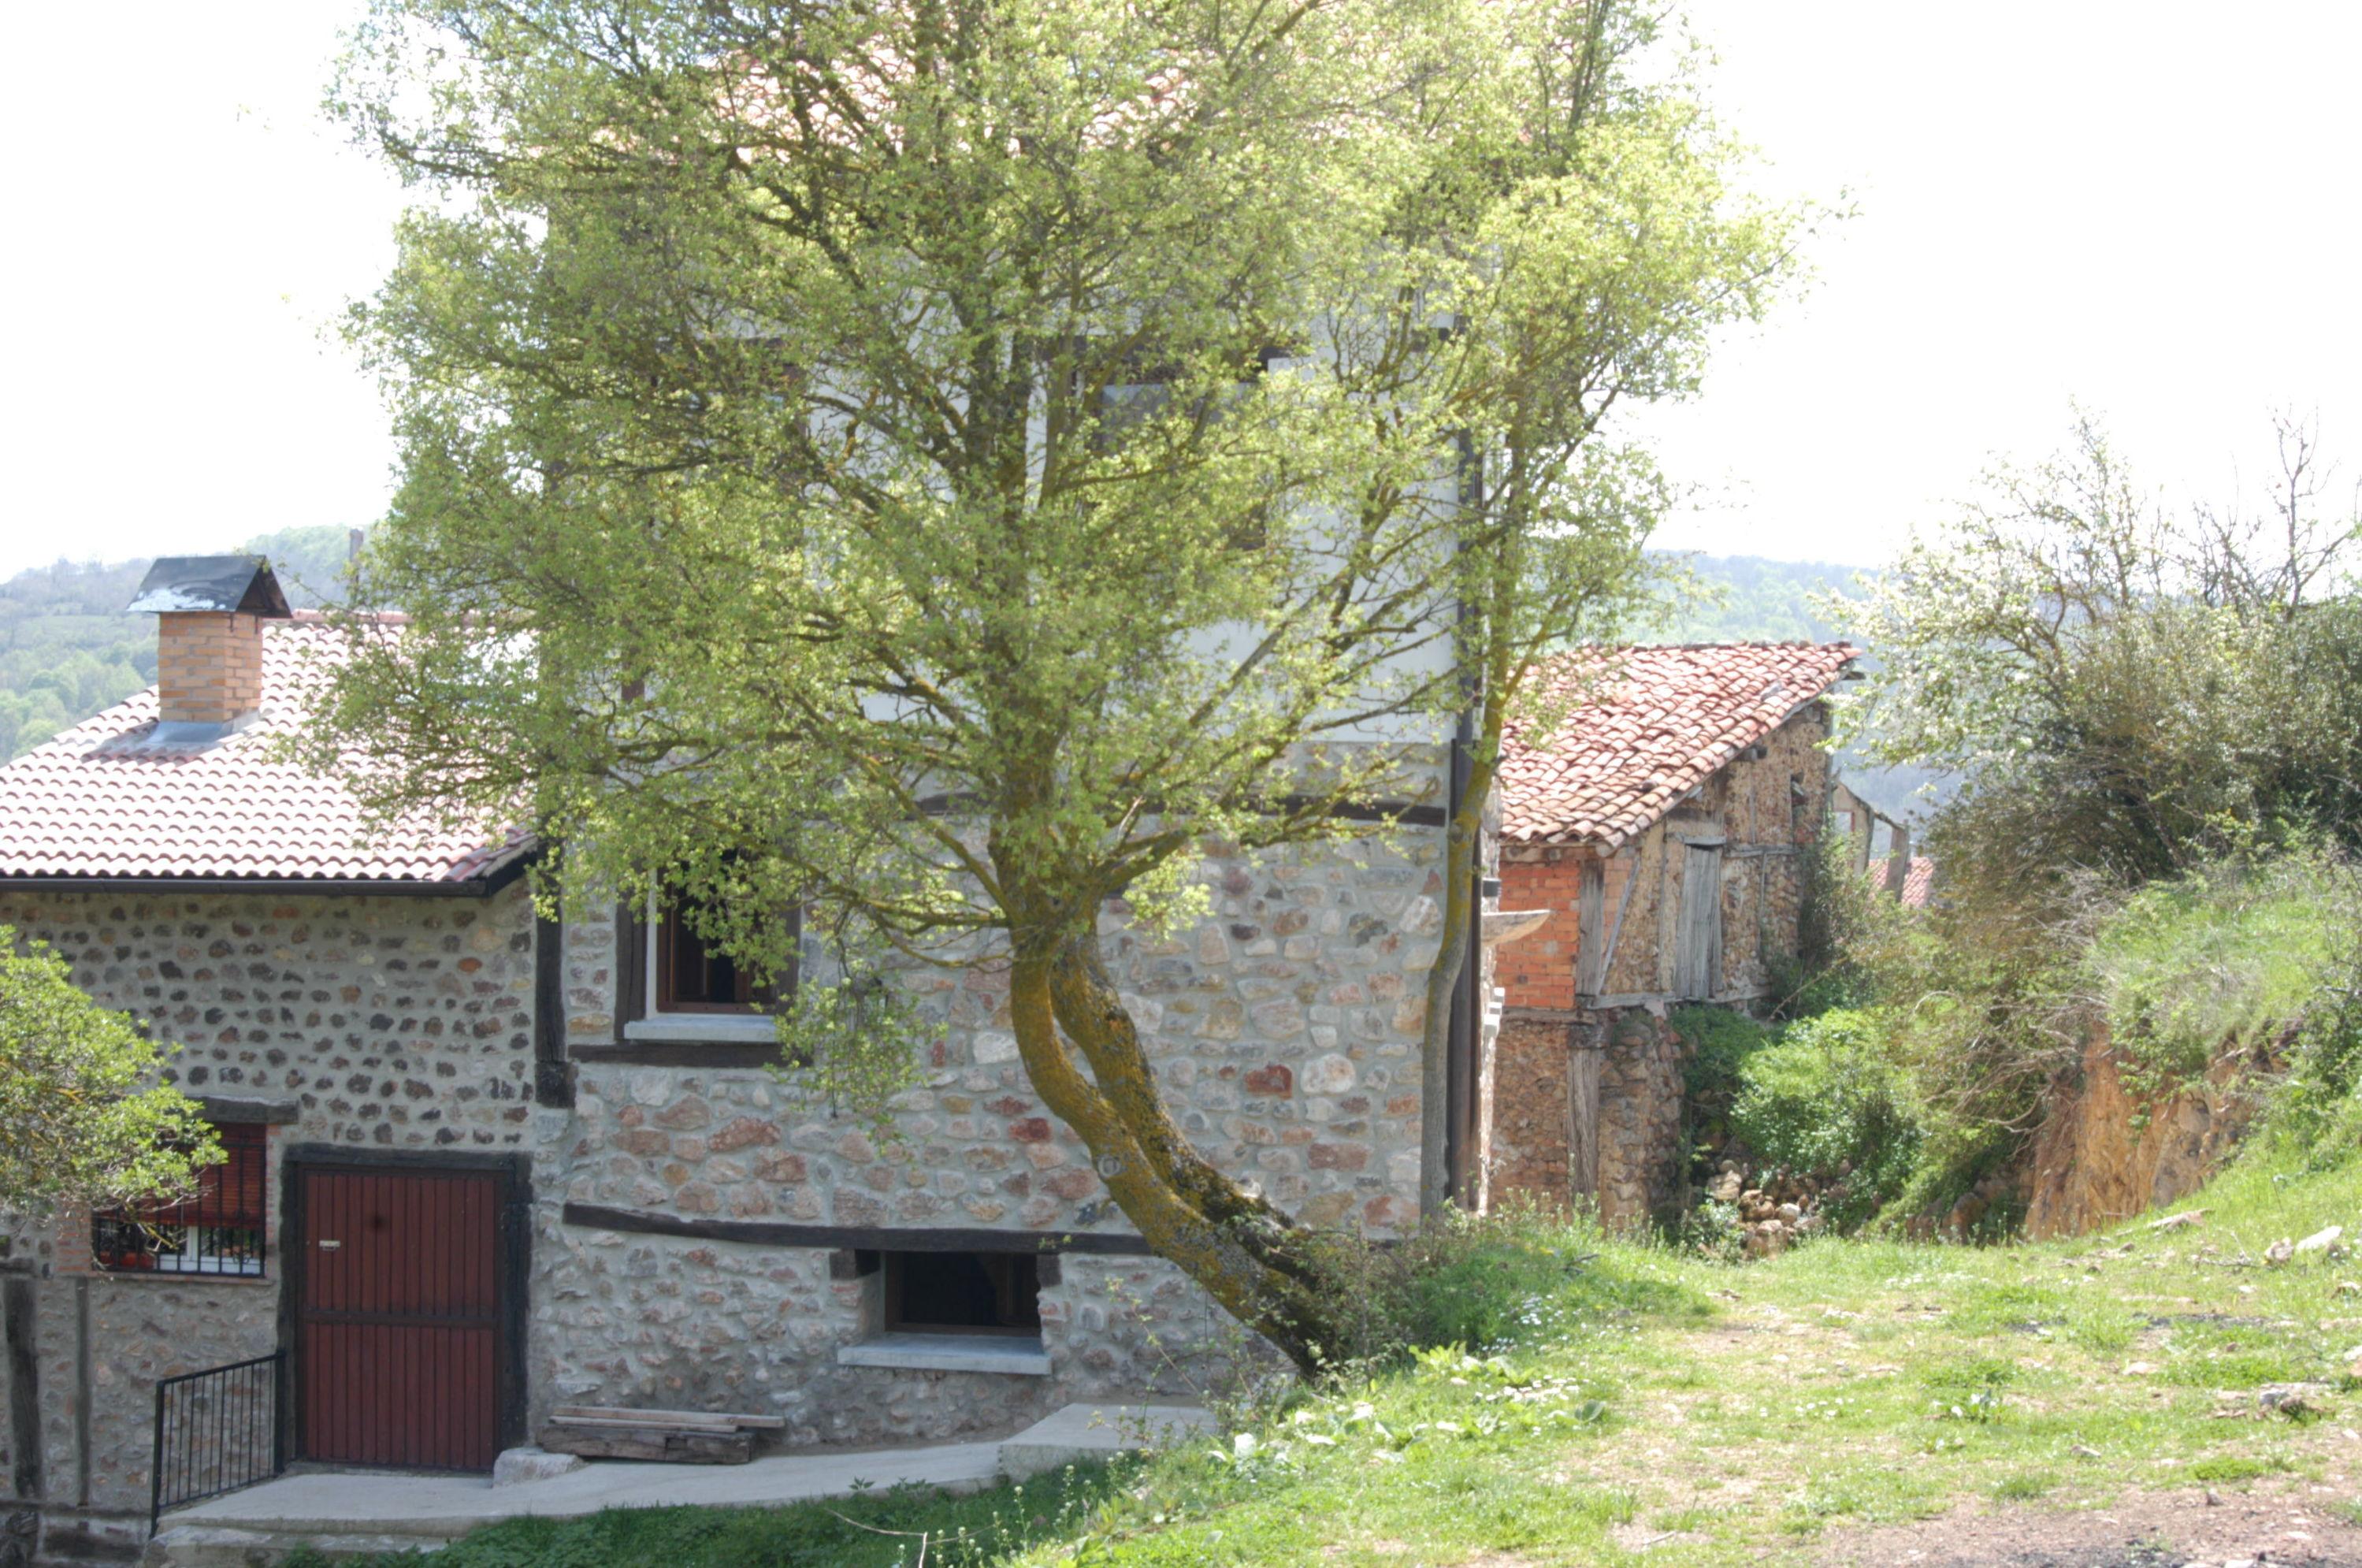 Casa rural en la montaña riojana